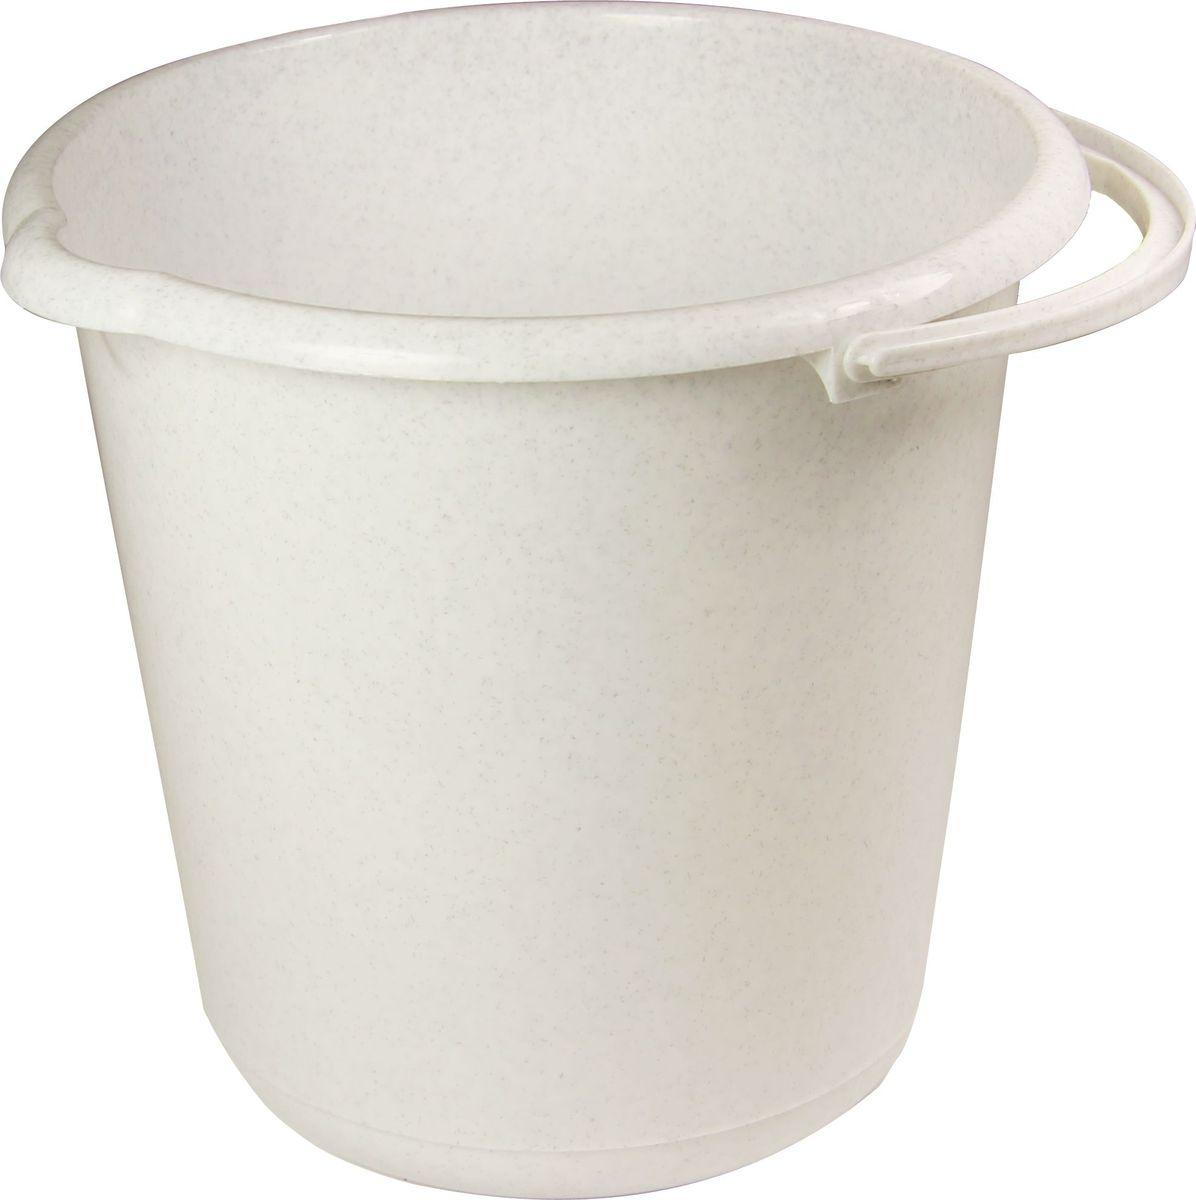 Ведро хозяйственное Idea, цвет: мраморный, 3 л ведро хозяйственное idea цвет аквамарин 3 л м 2428